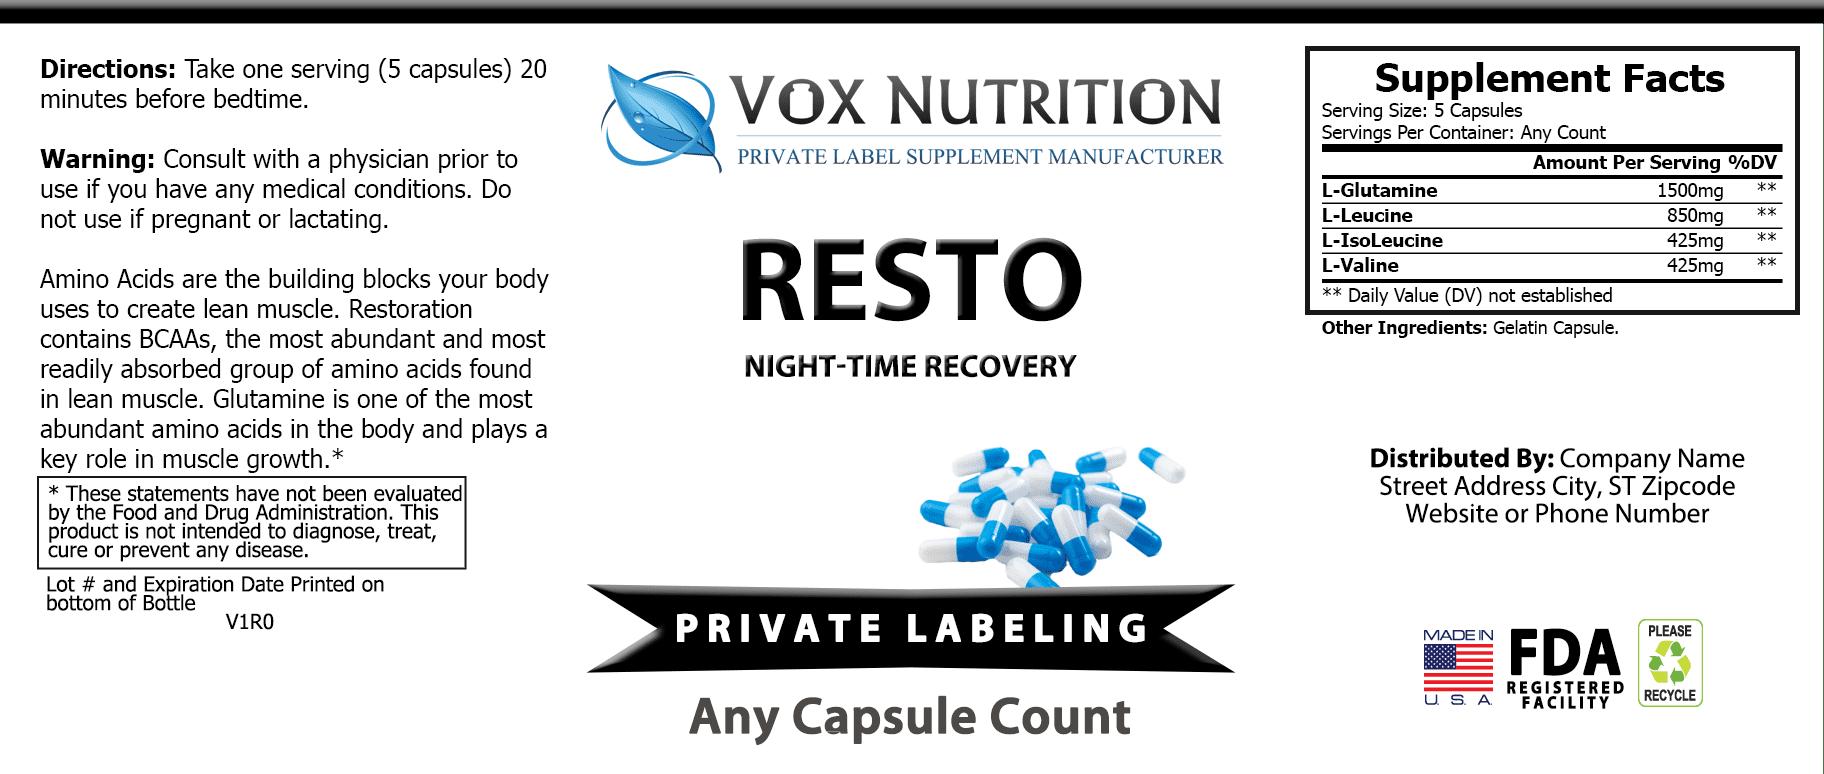 private label resto night time recovery vitamin supplement label